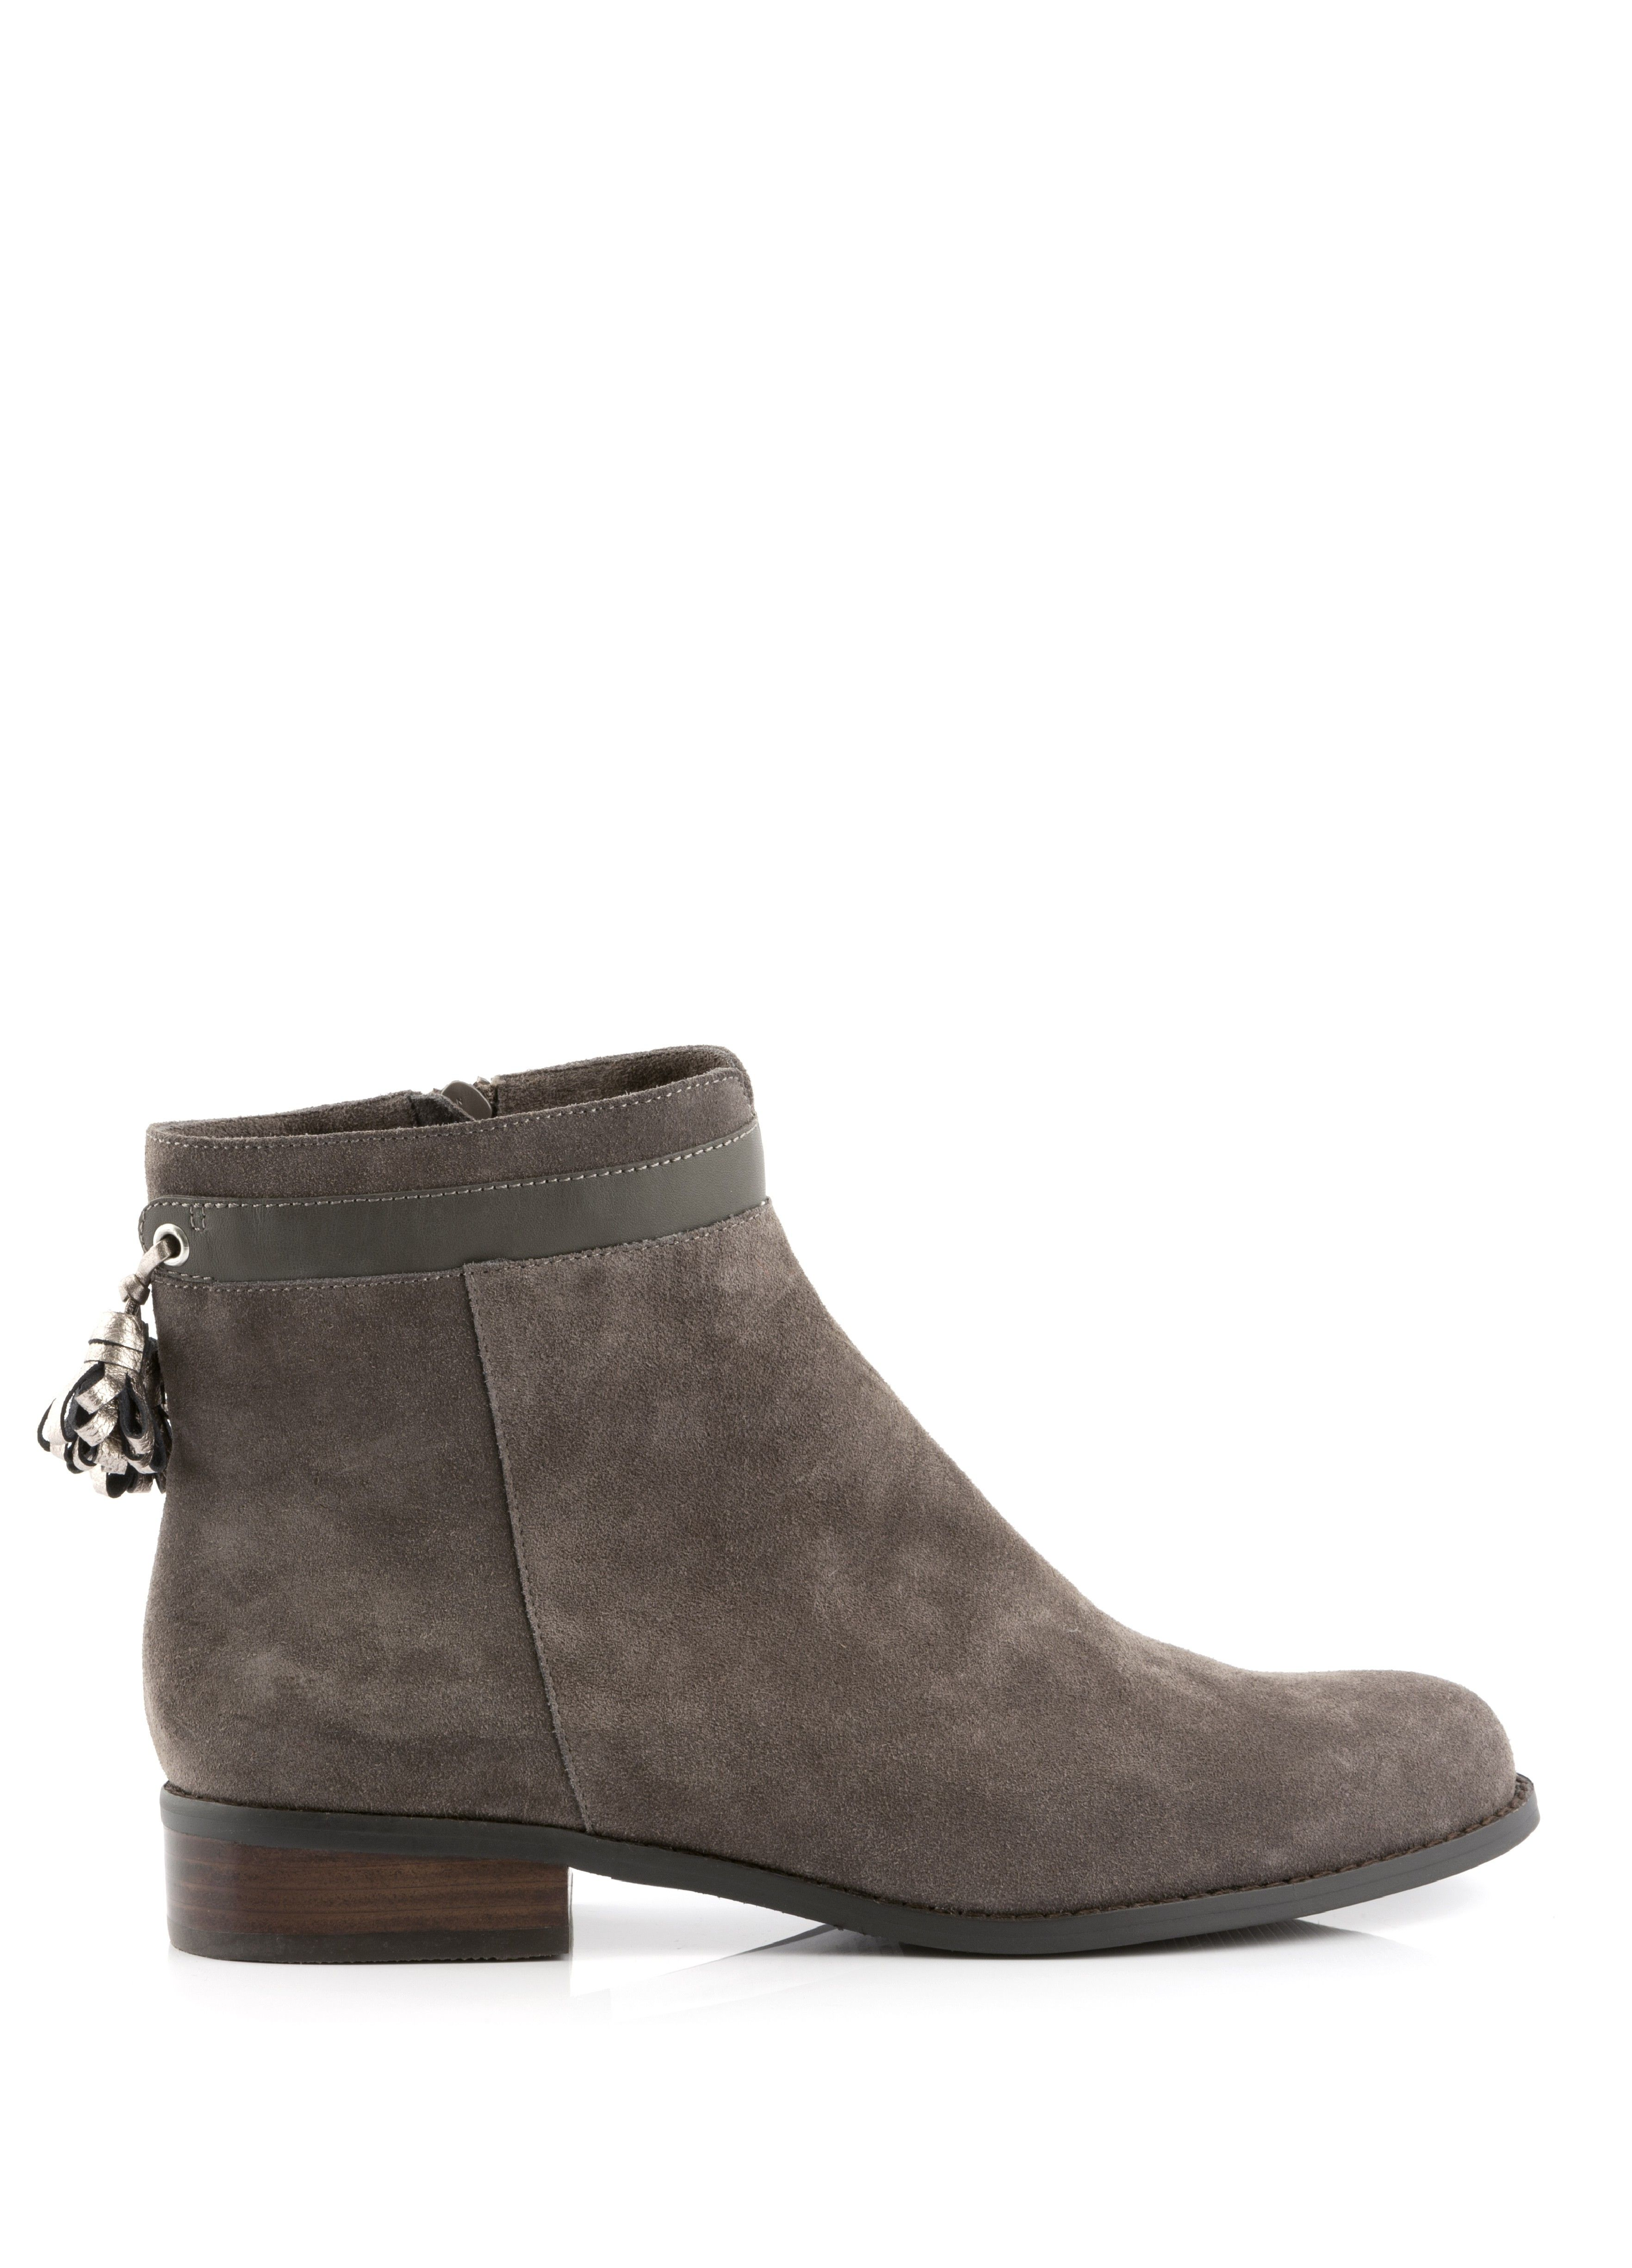 bottine rafale gris chaussures femme femme w a r d r o b e pinterest fall winter shoes. Black Bedroom Furniture Sets. Home Design Ideas